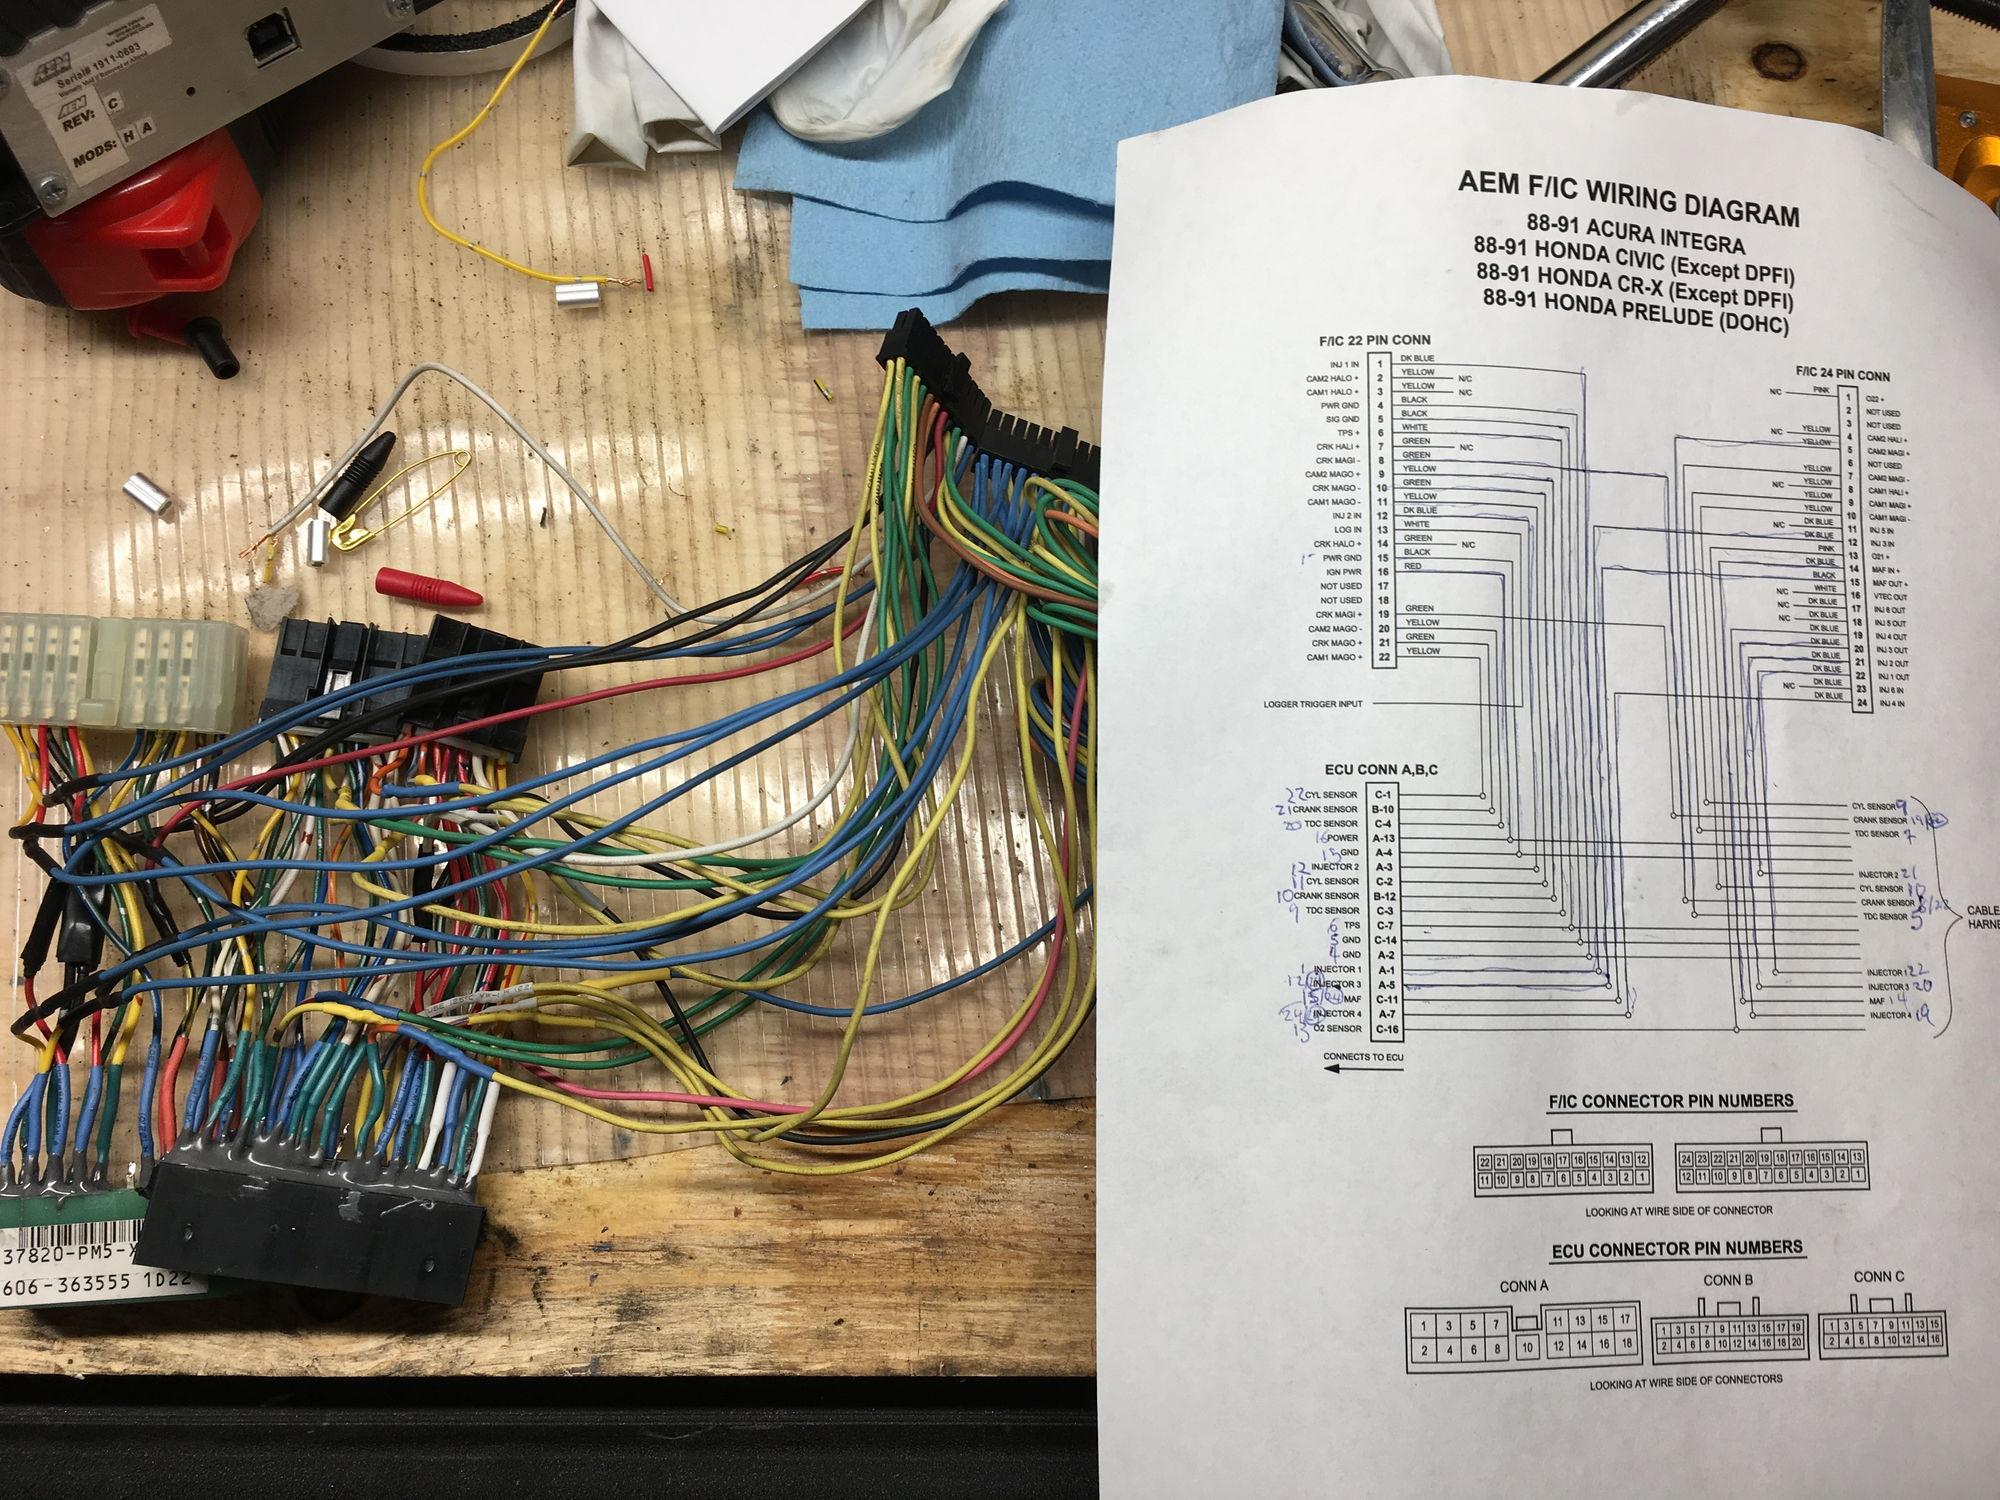 aem fic6 tuning a b18a obd0 pr4 code 9 honda tech honda forum vw jetta wiring diagram a bit messy lol